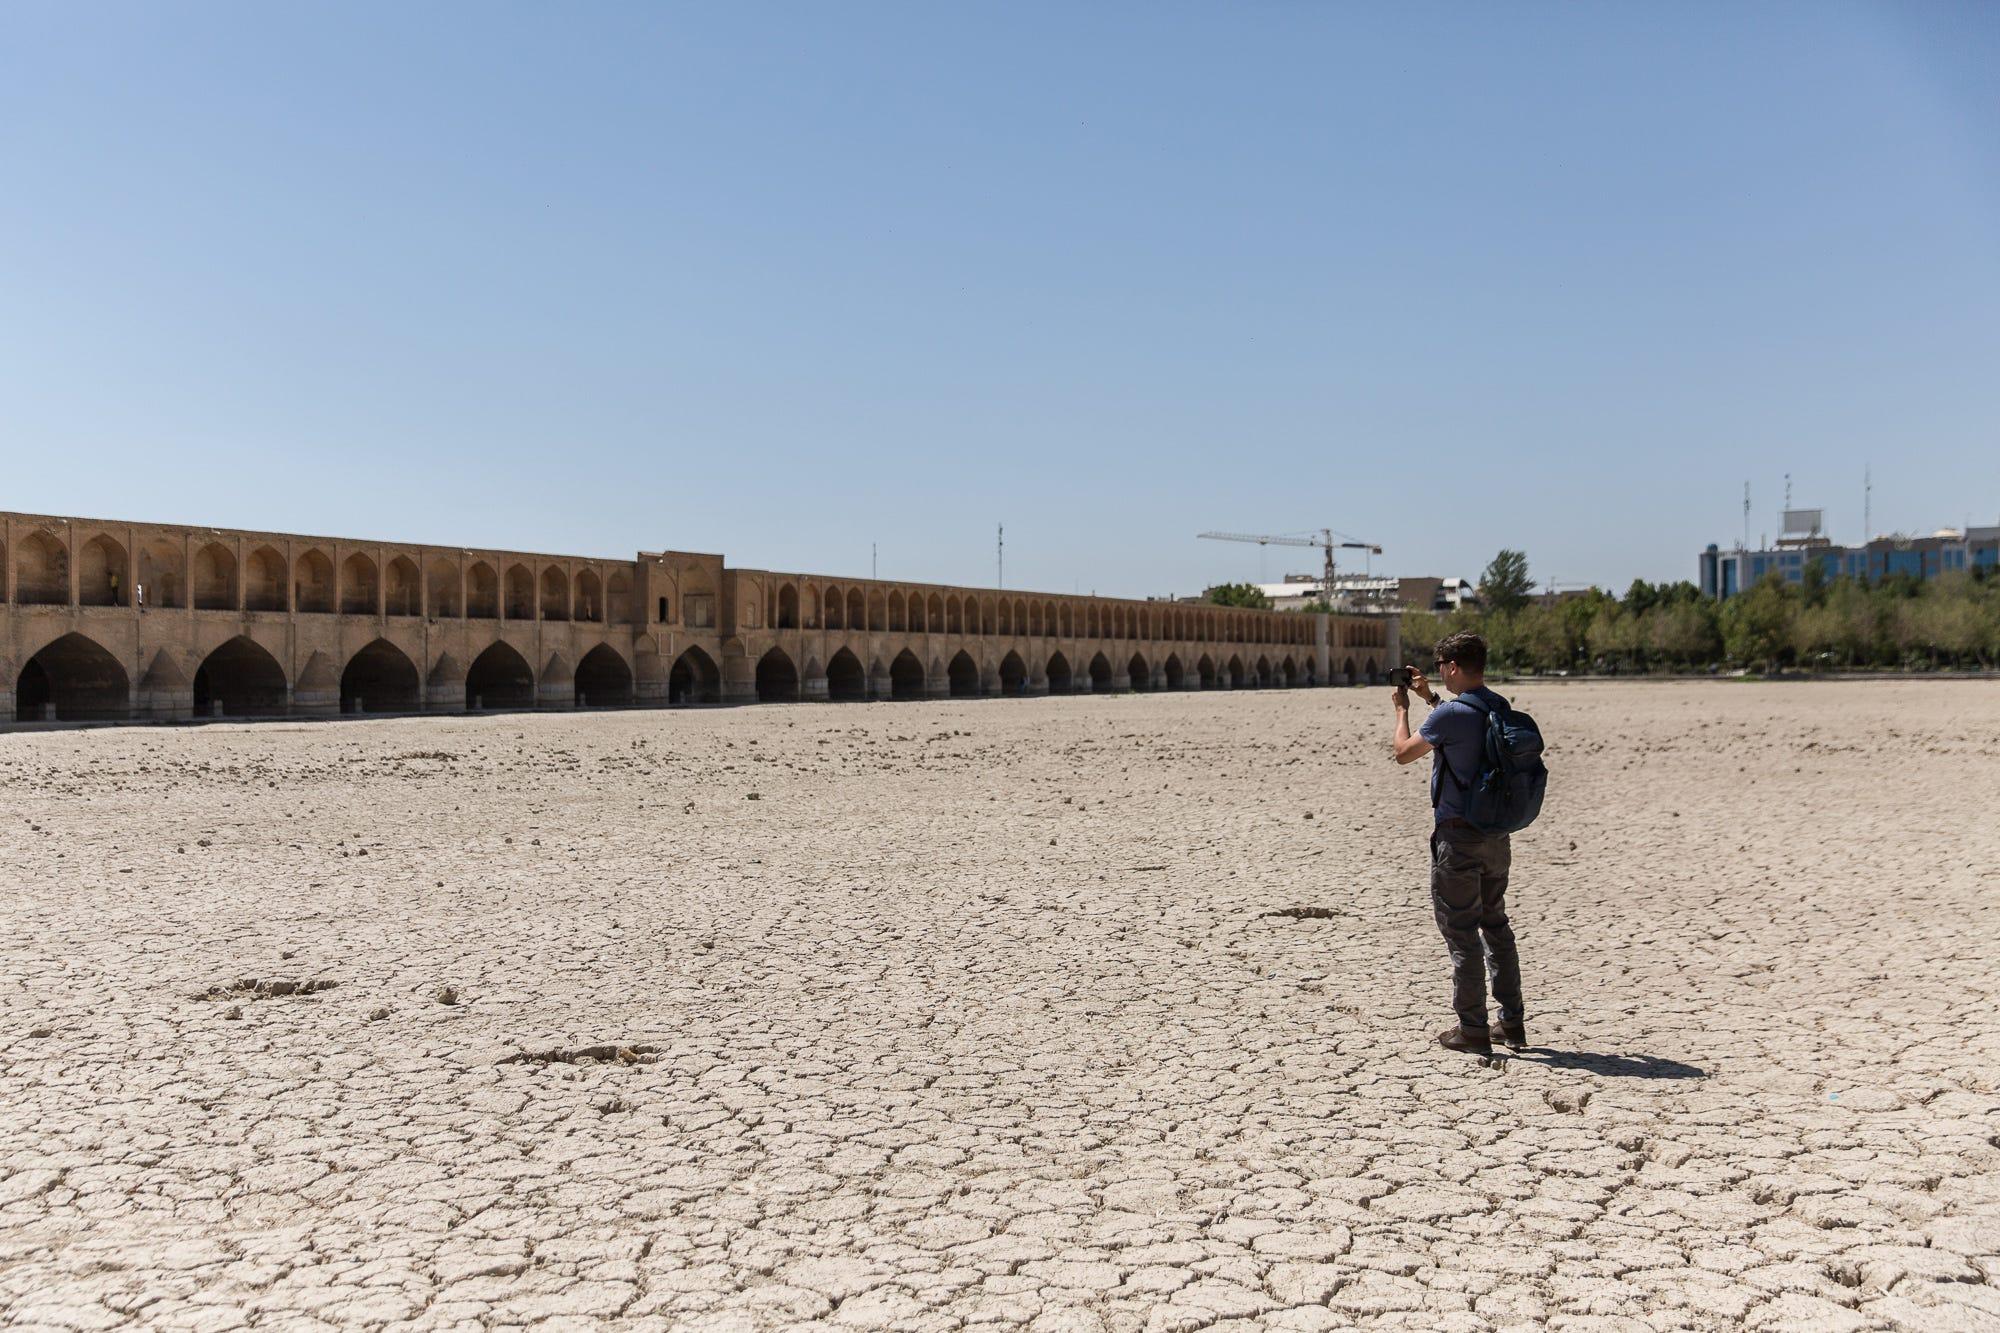 Kim Hjelmgaard takes a photo of Isfahan's Allahverdi Khan Bridge, also known as Siosepol.